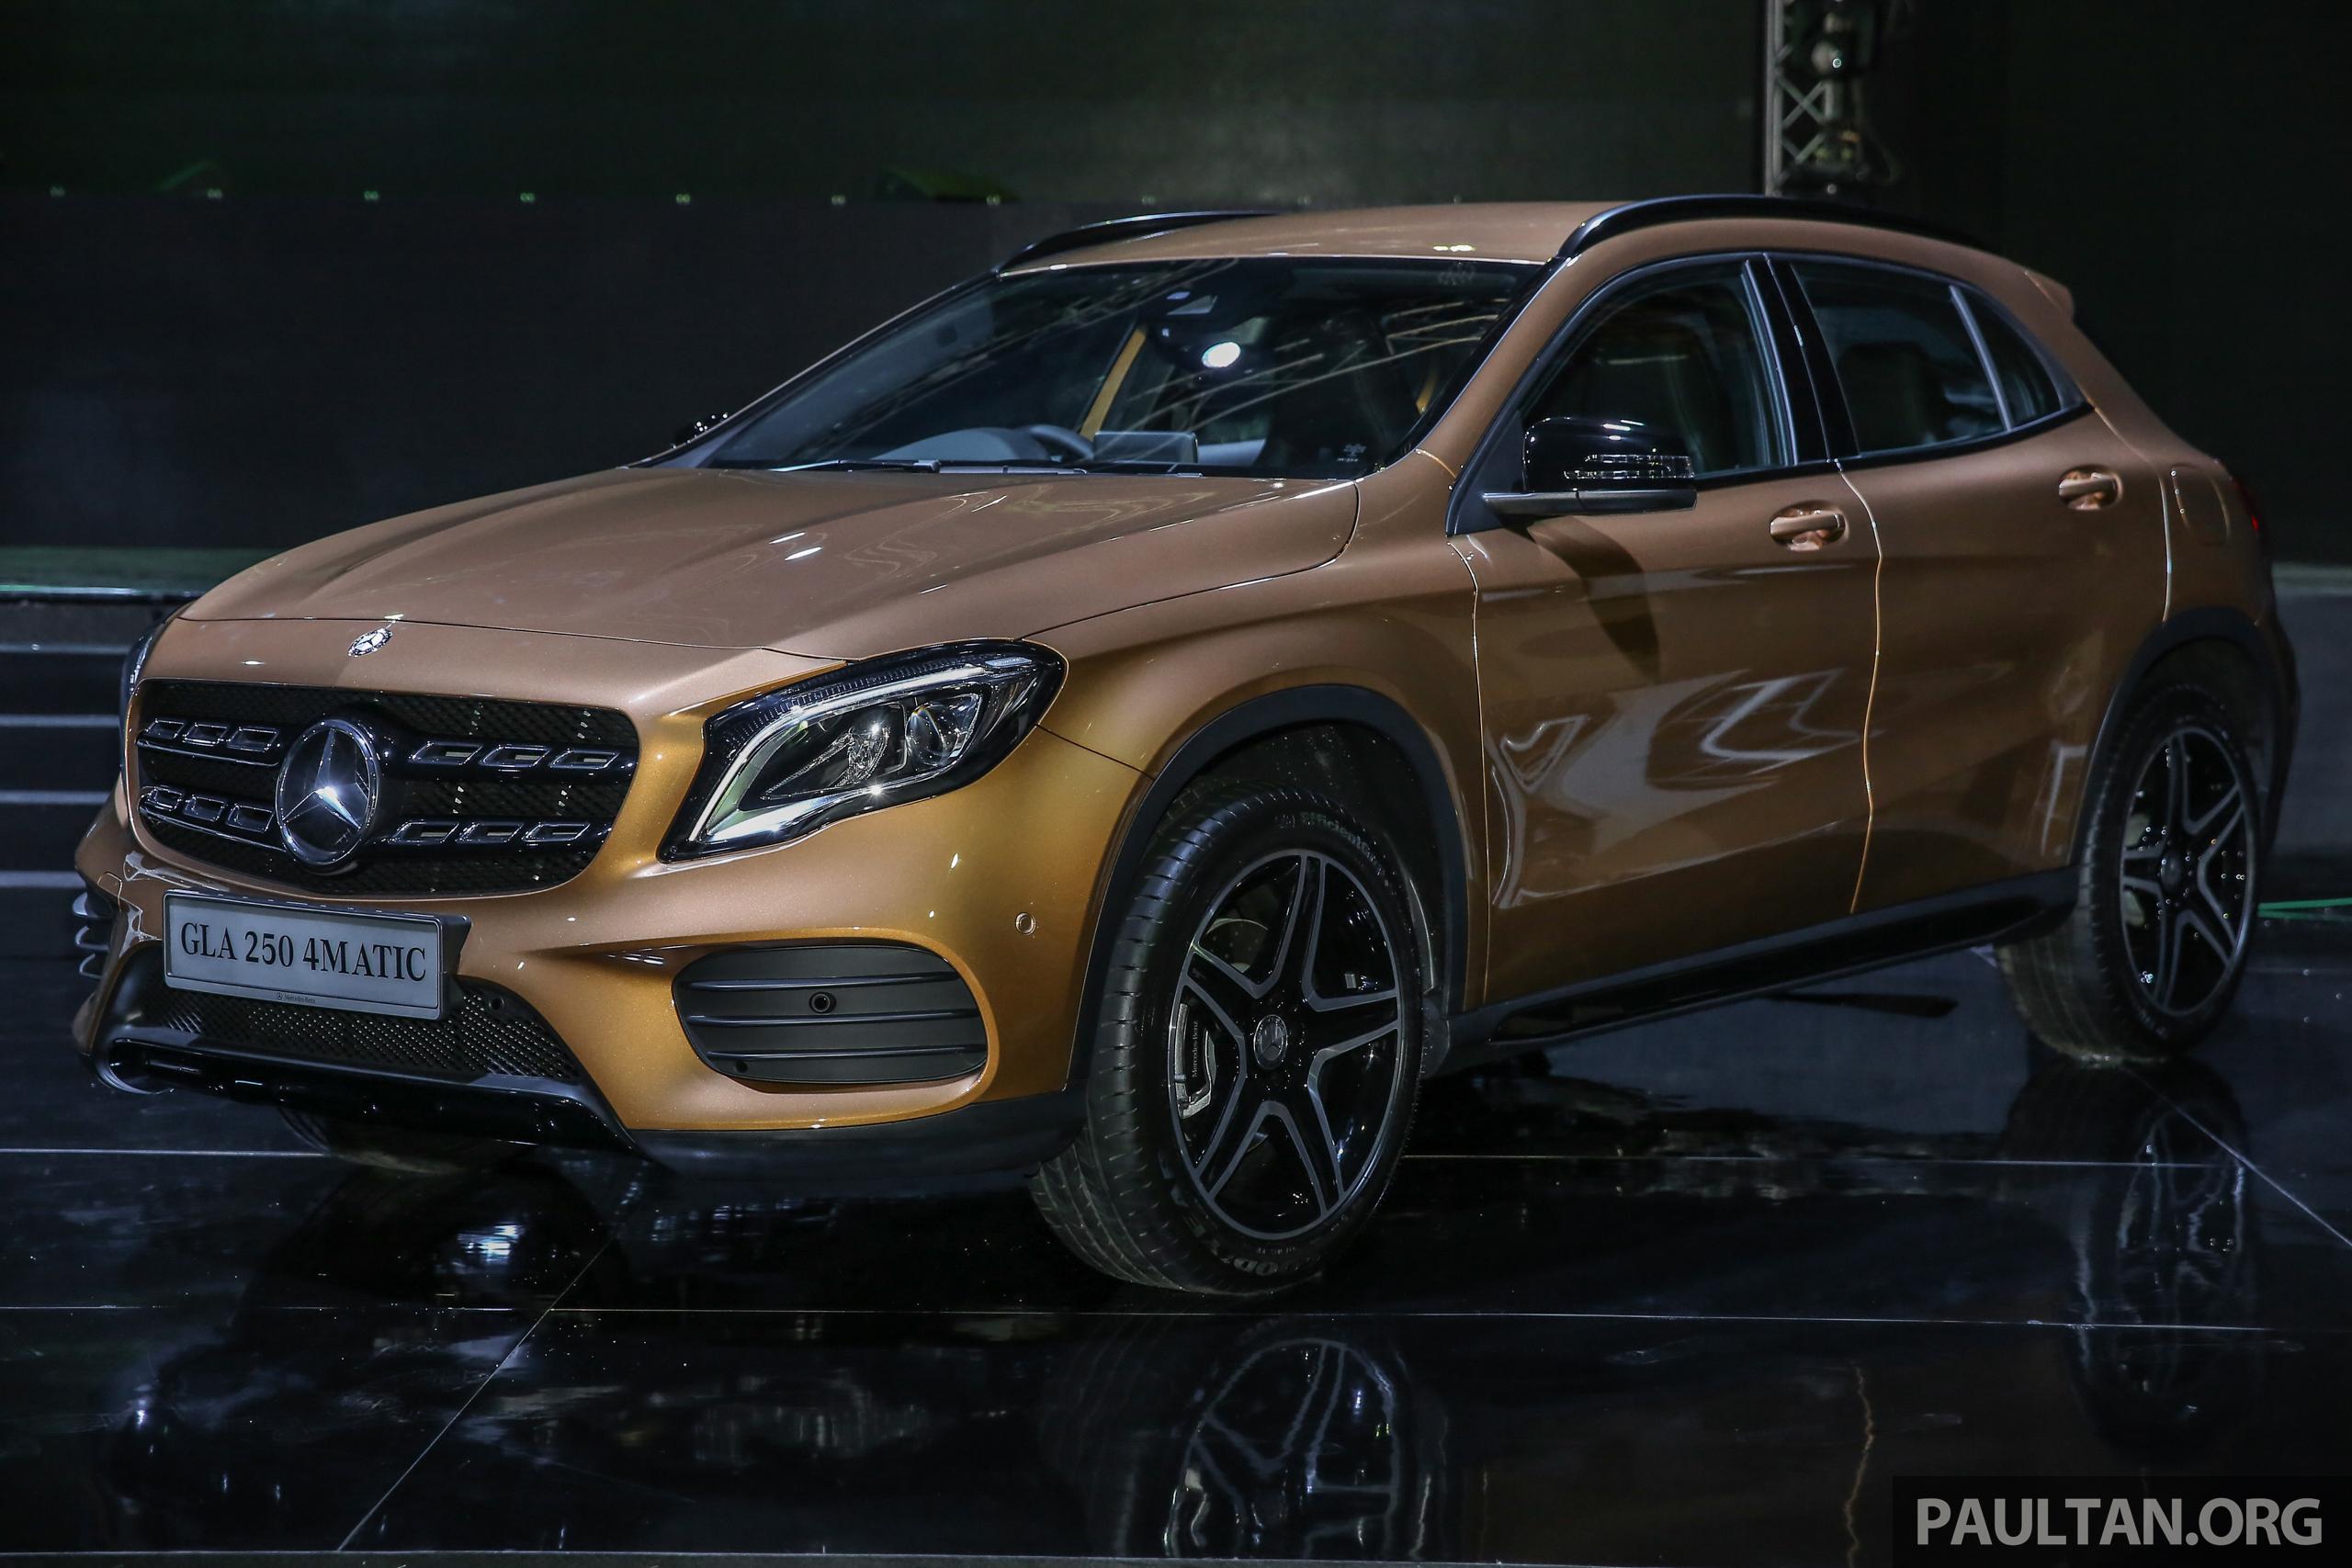 Mercedes benz gla 200 gla 250 4matic facelift turut for Mercedes benz gla 250